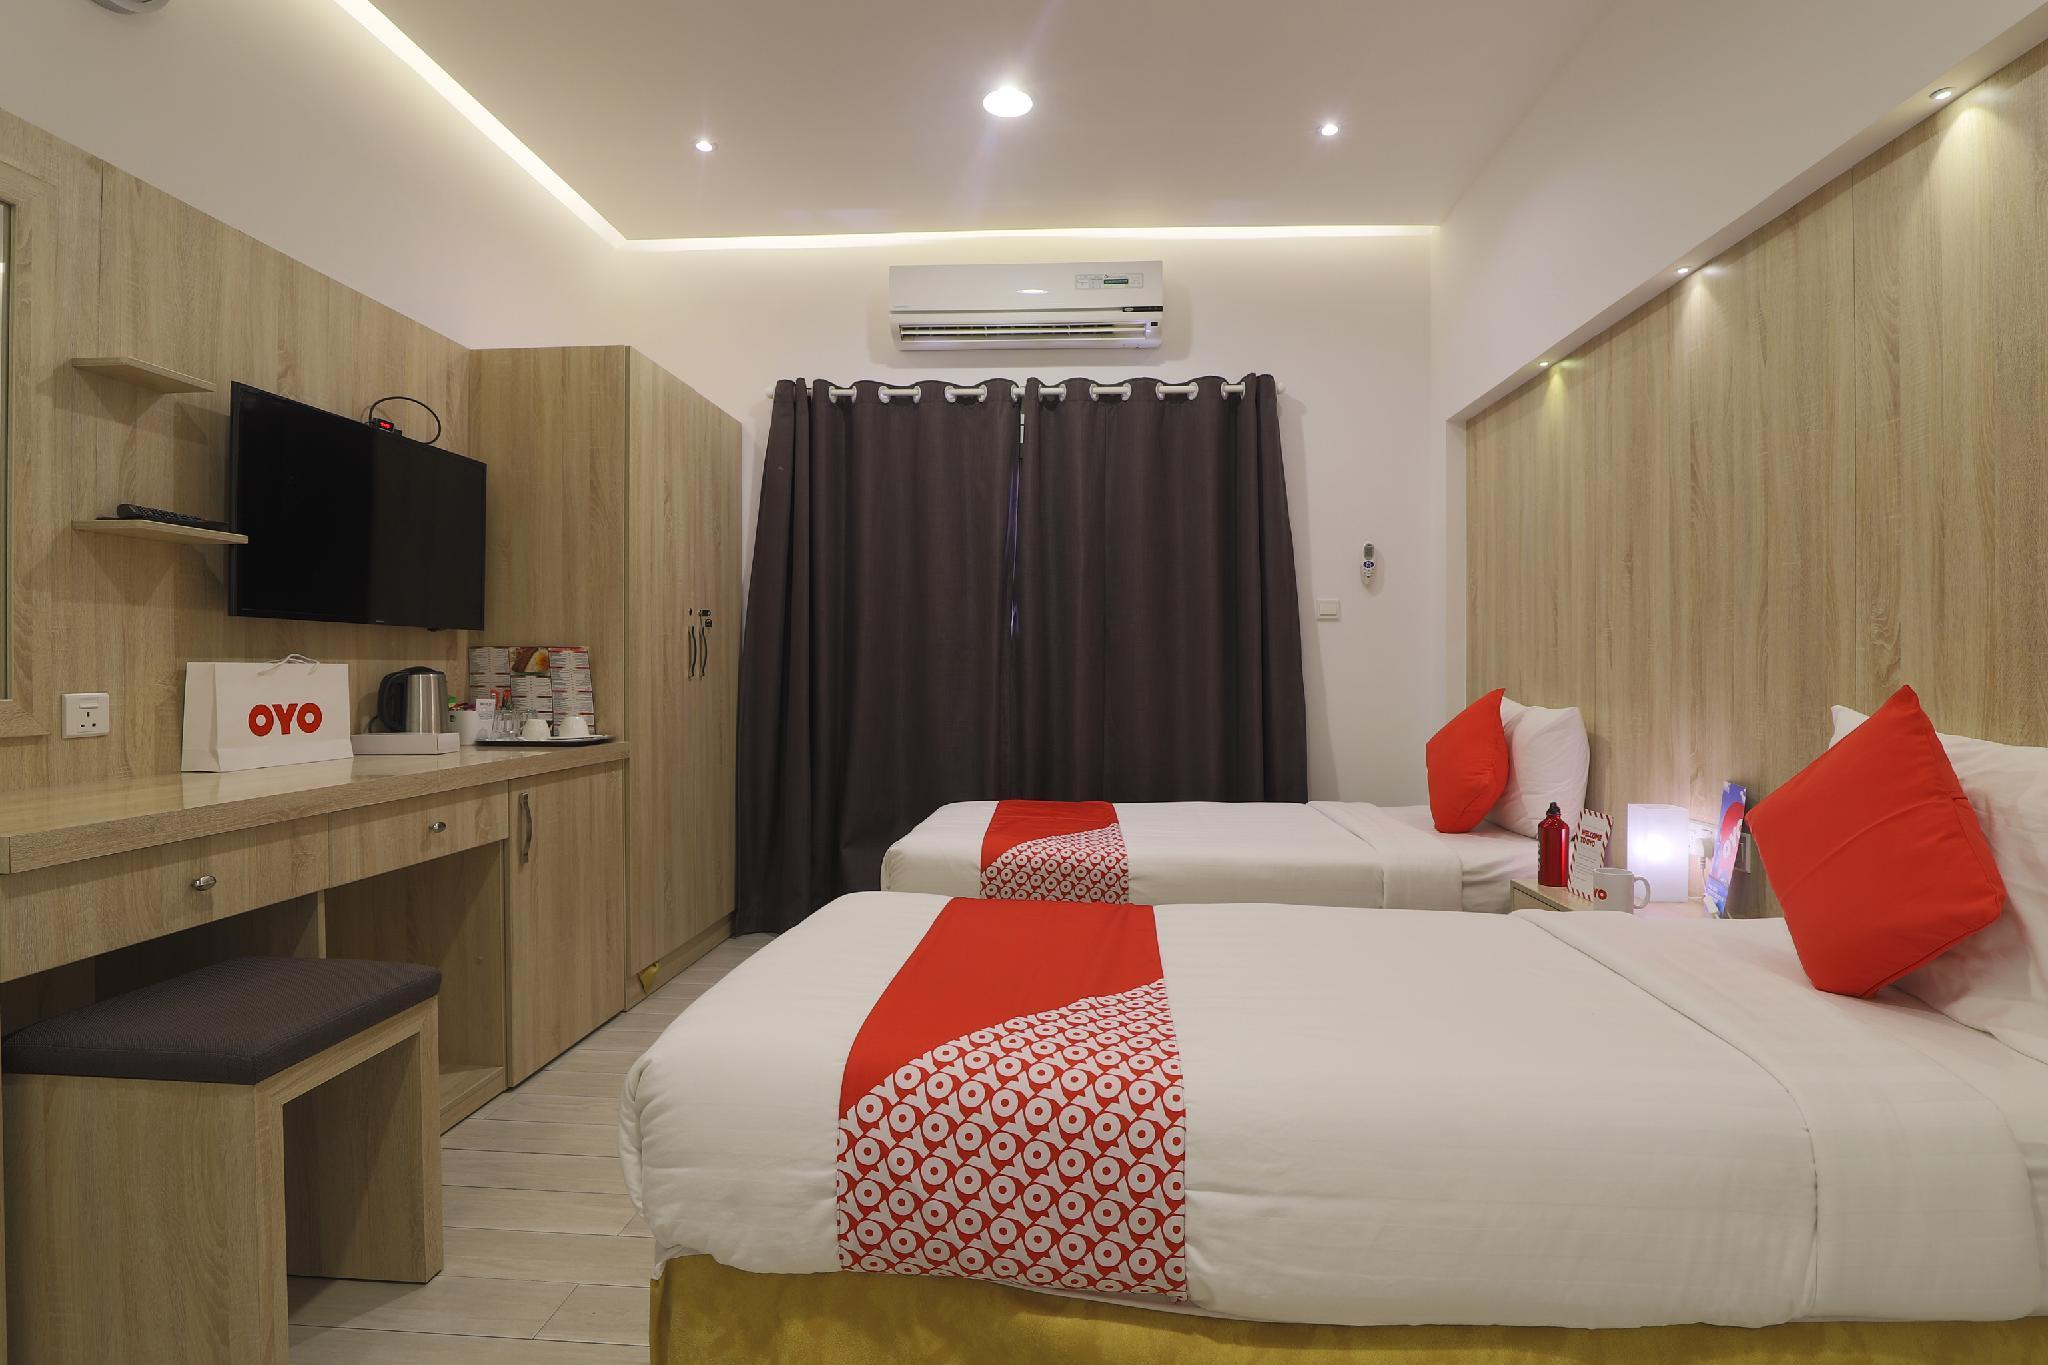 OYO 314 24 Gold Hotel